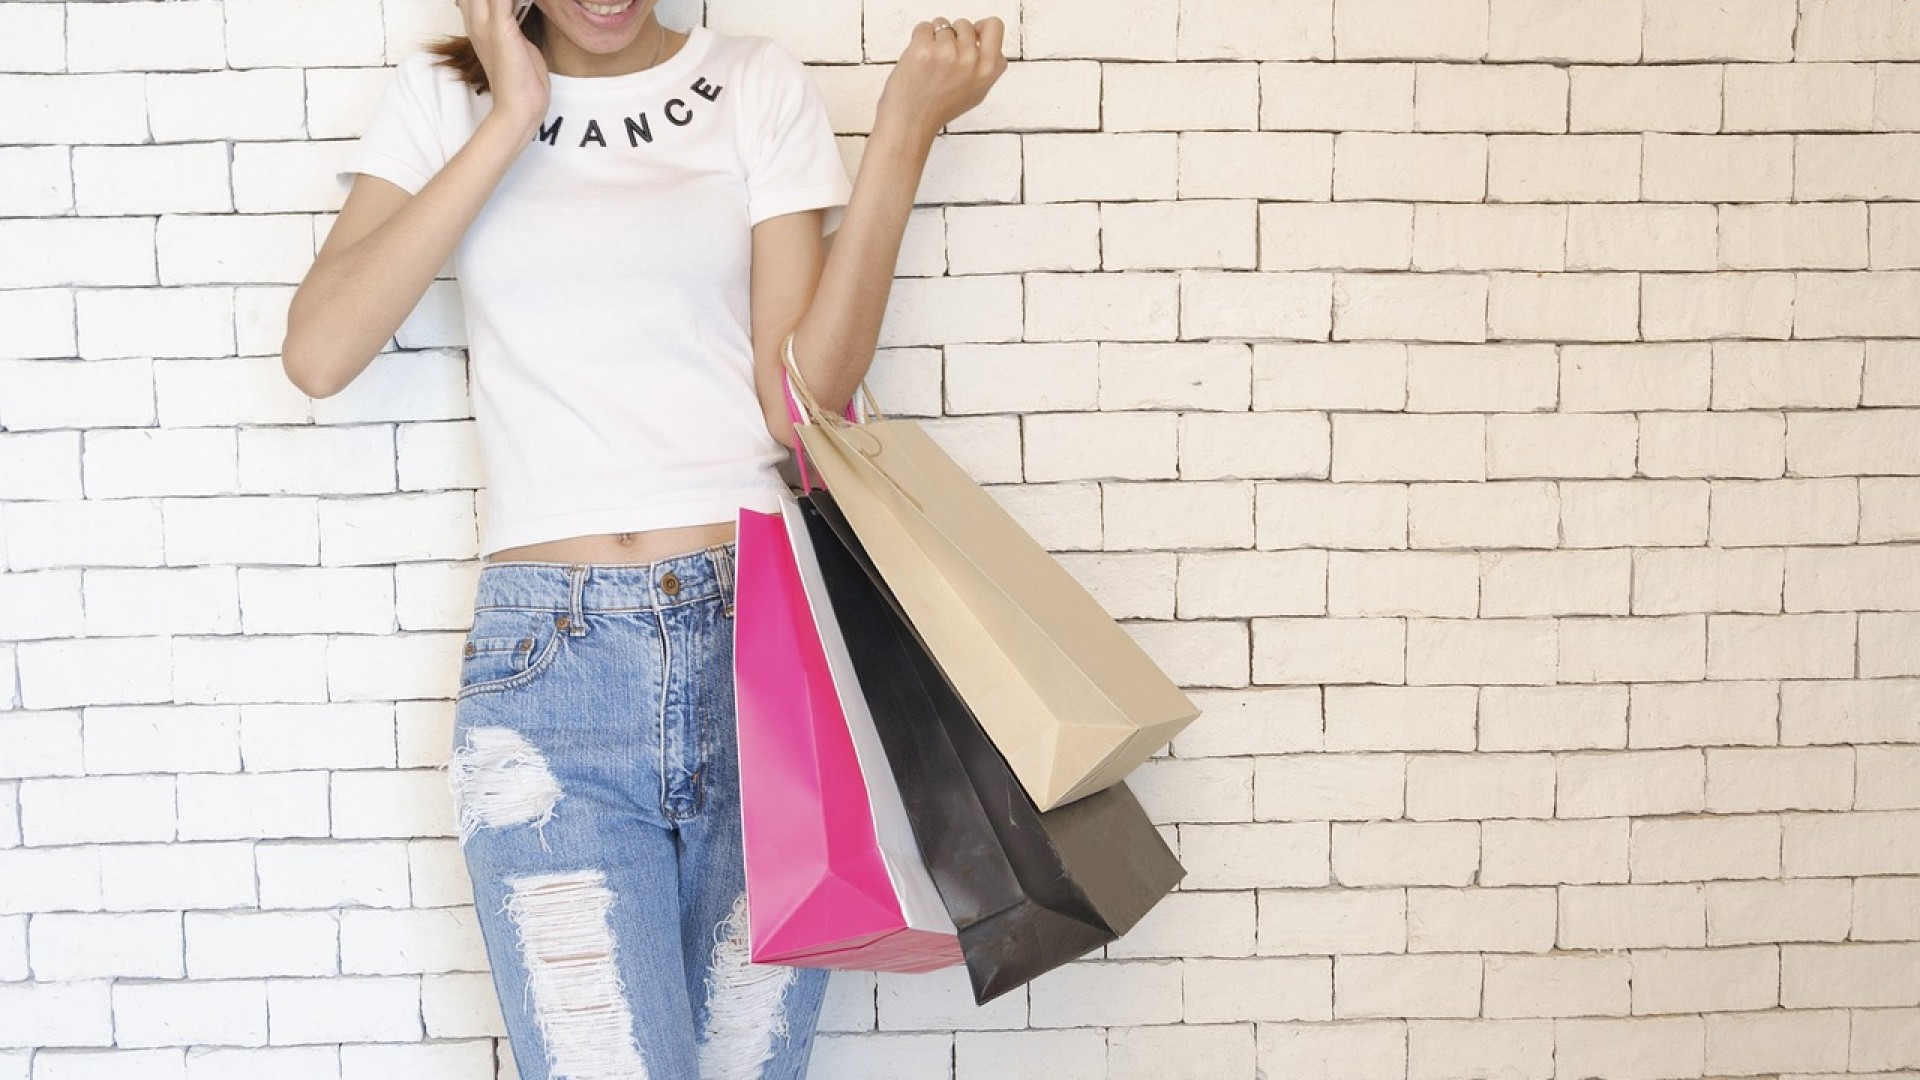 Shopping Download Wallpaper